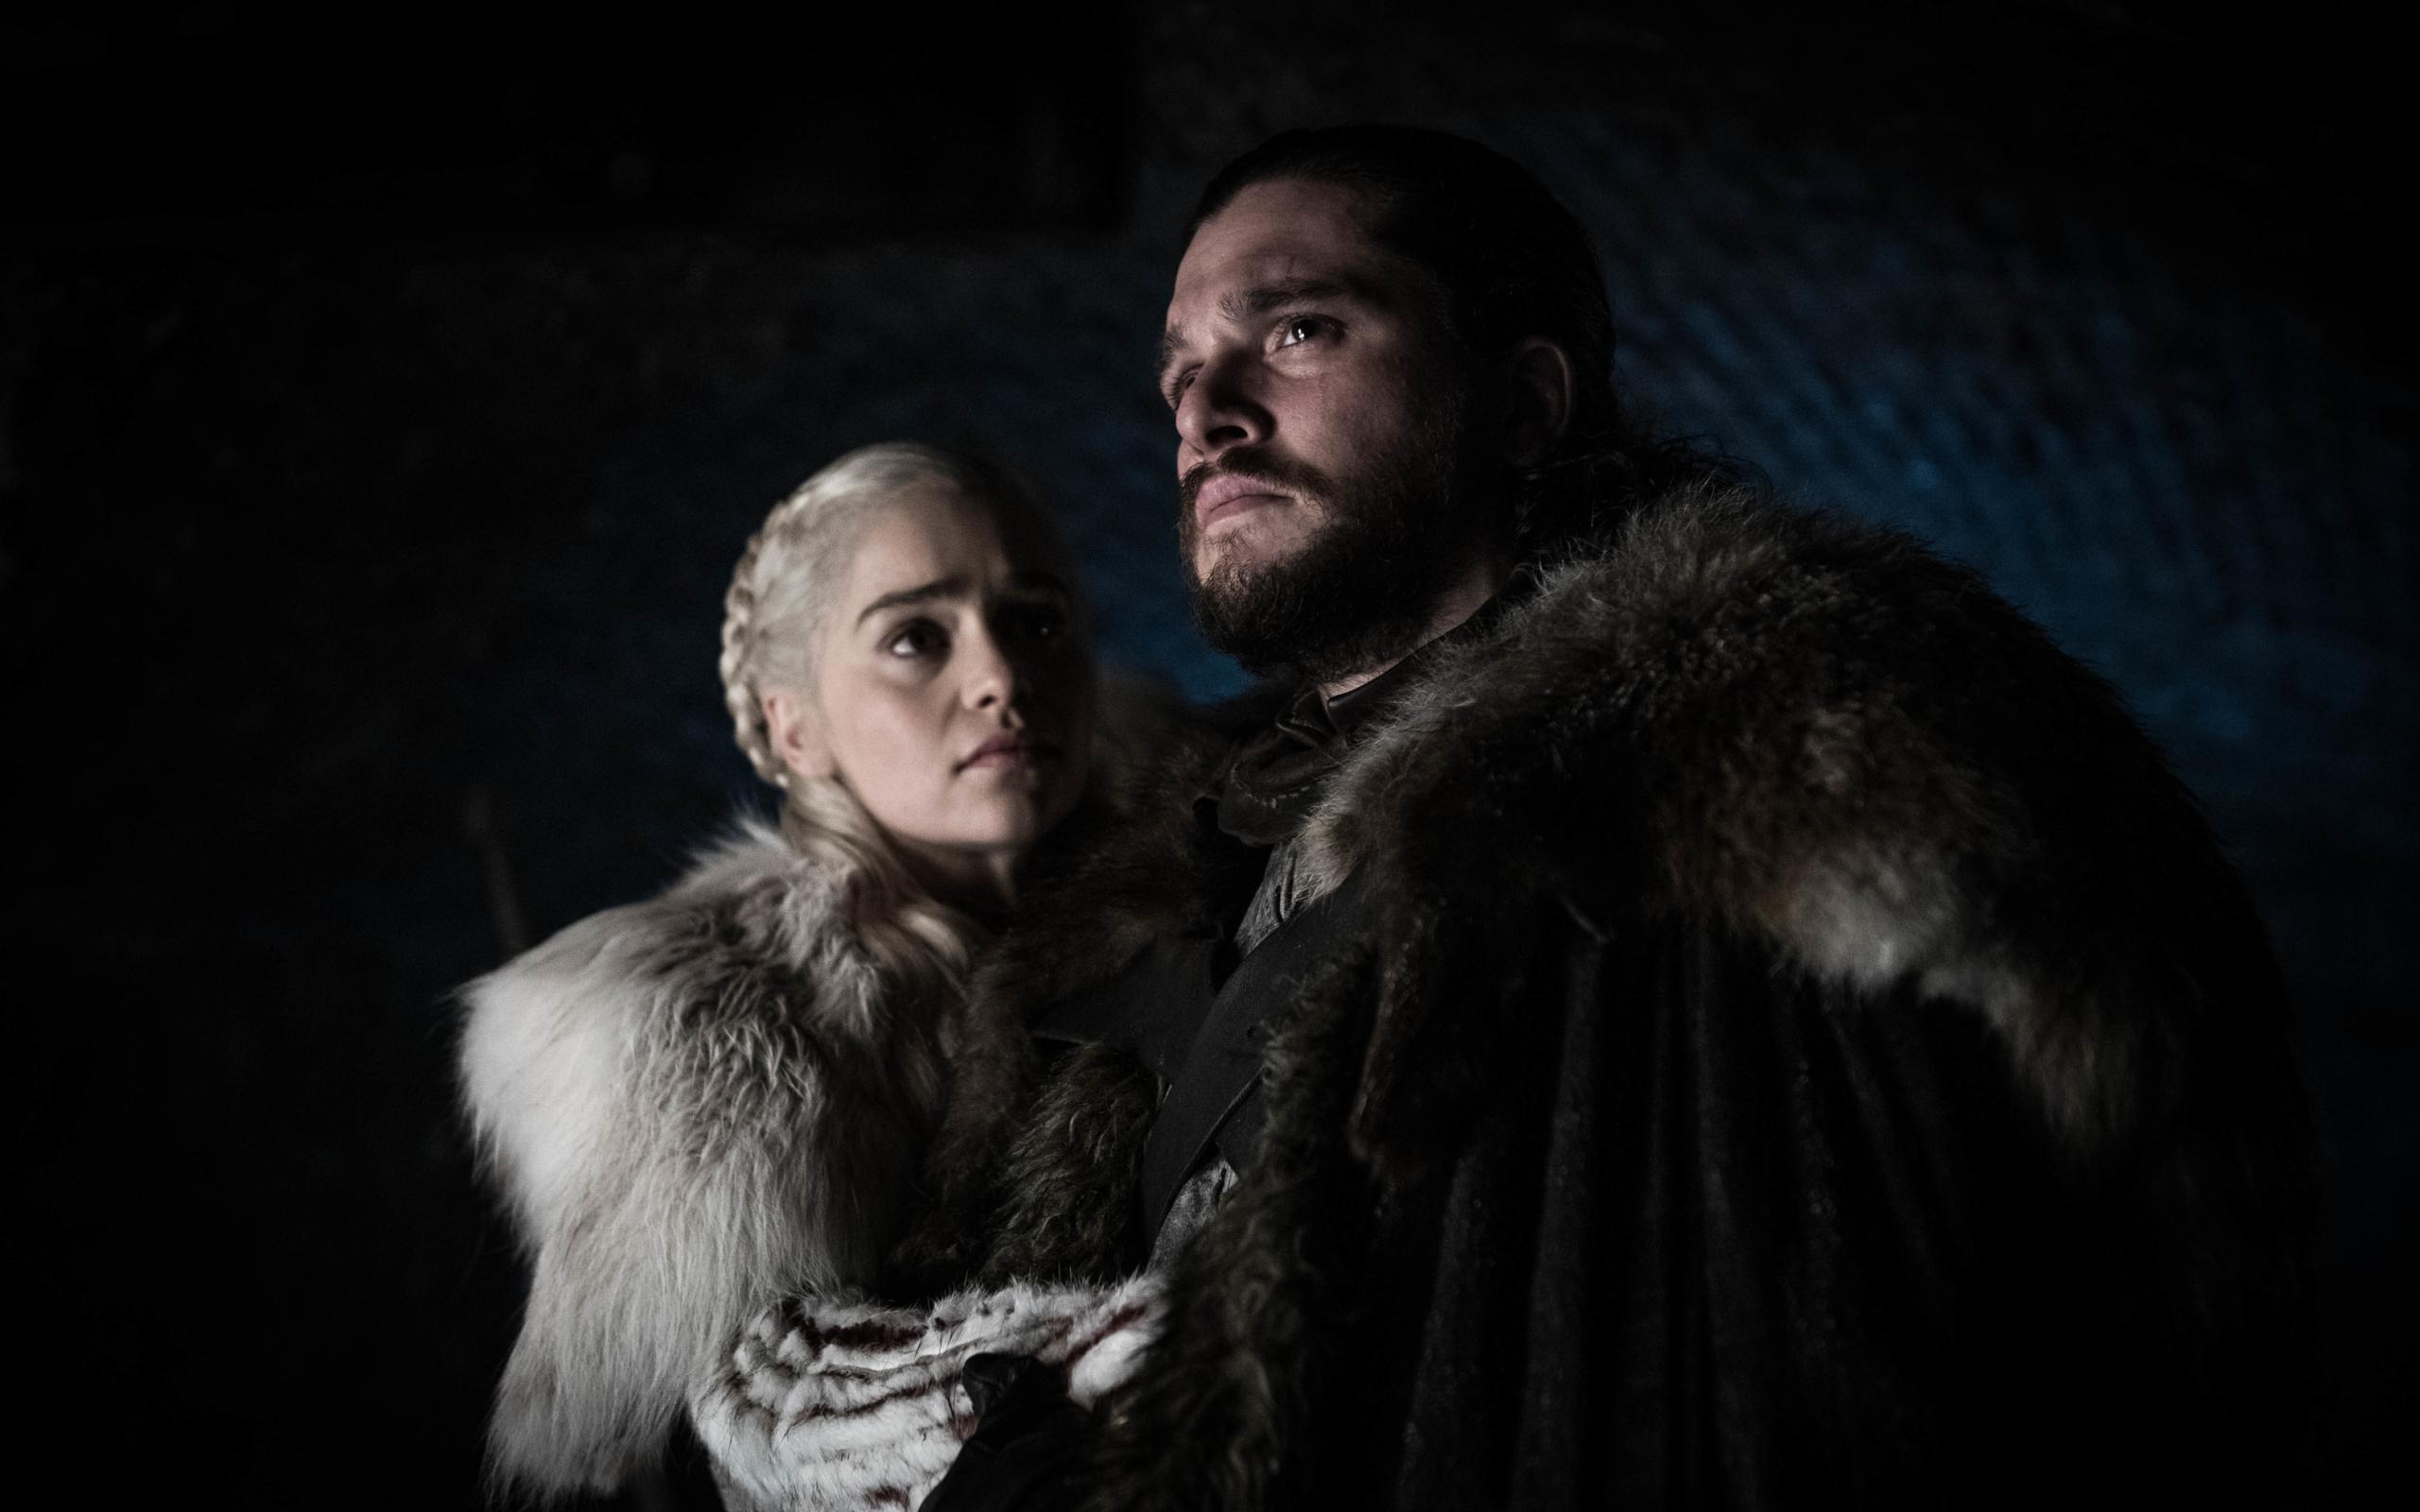 2560x1600 Game Of Thrones Season 8 Jon Snow And Daenerys Targaryen